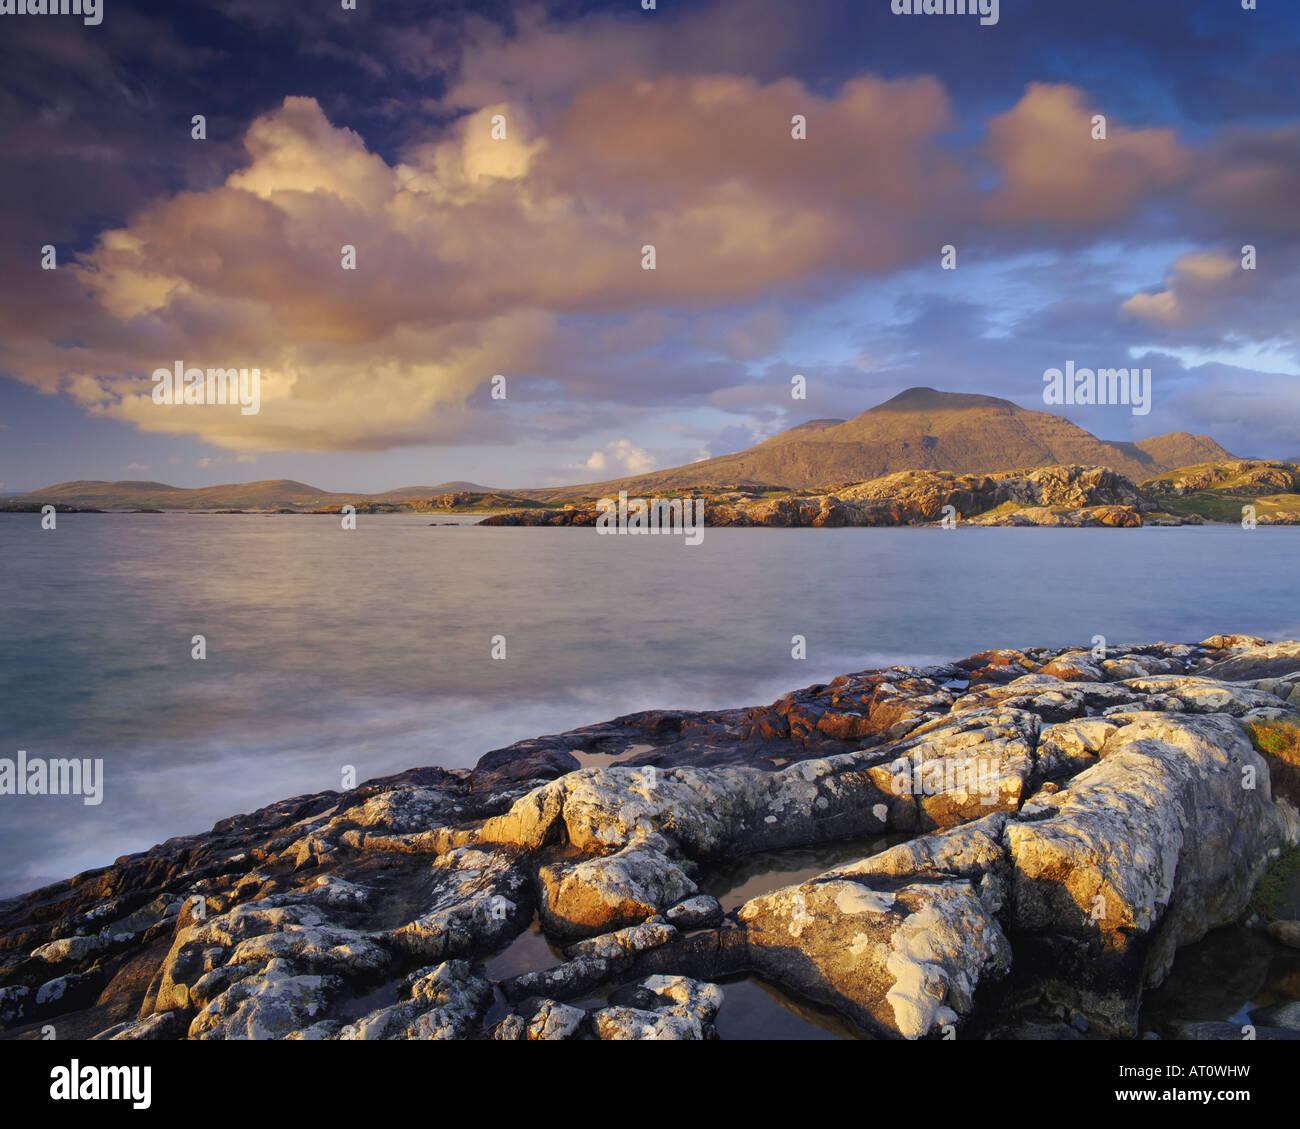 IE - CONNEMARA: Coastline at Lettergesh - Stock Image